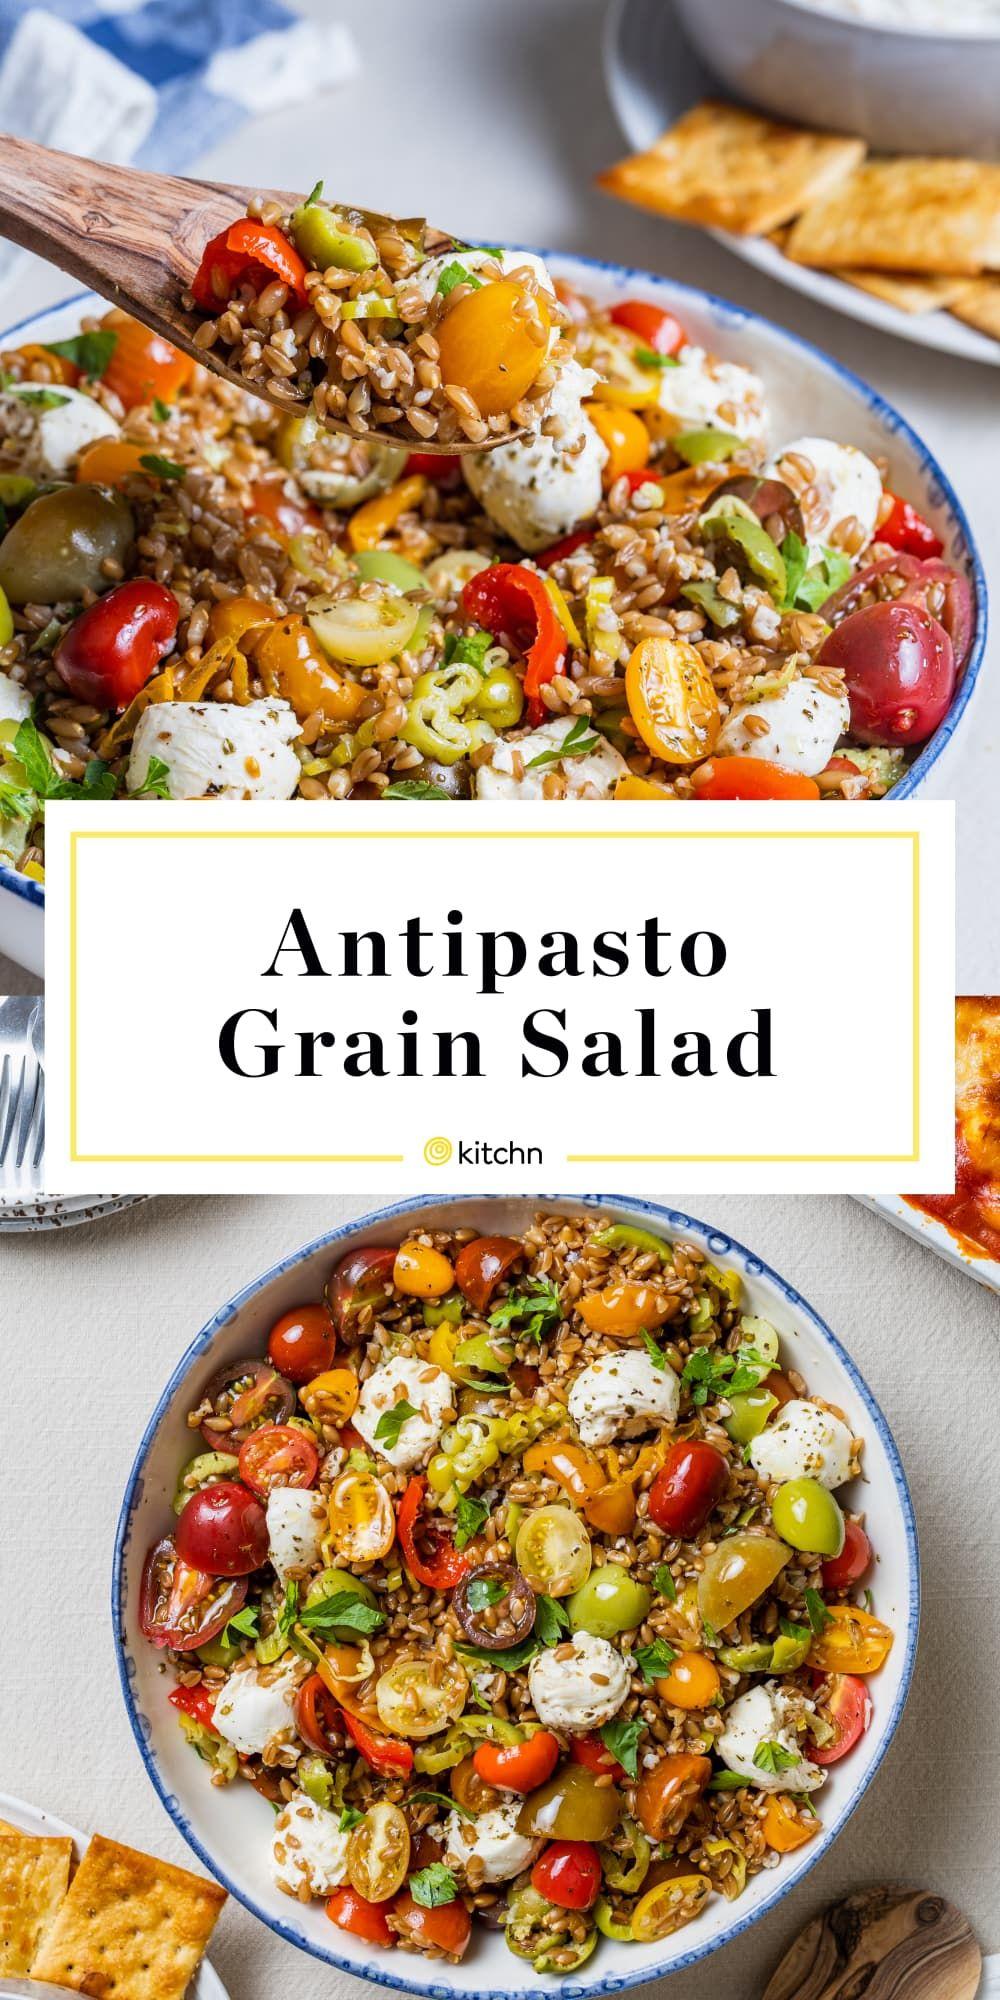 This No-Wilt Antipasto Grain Salad Is the Ultimate Potluck Win